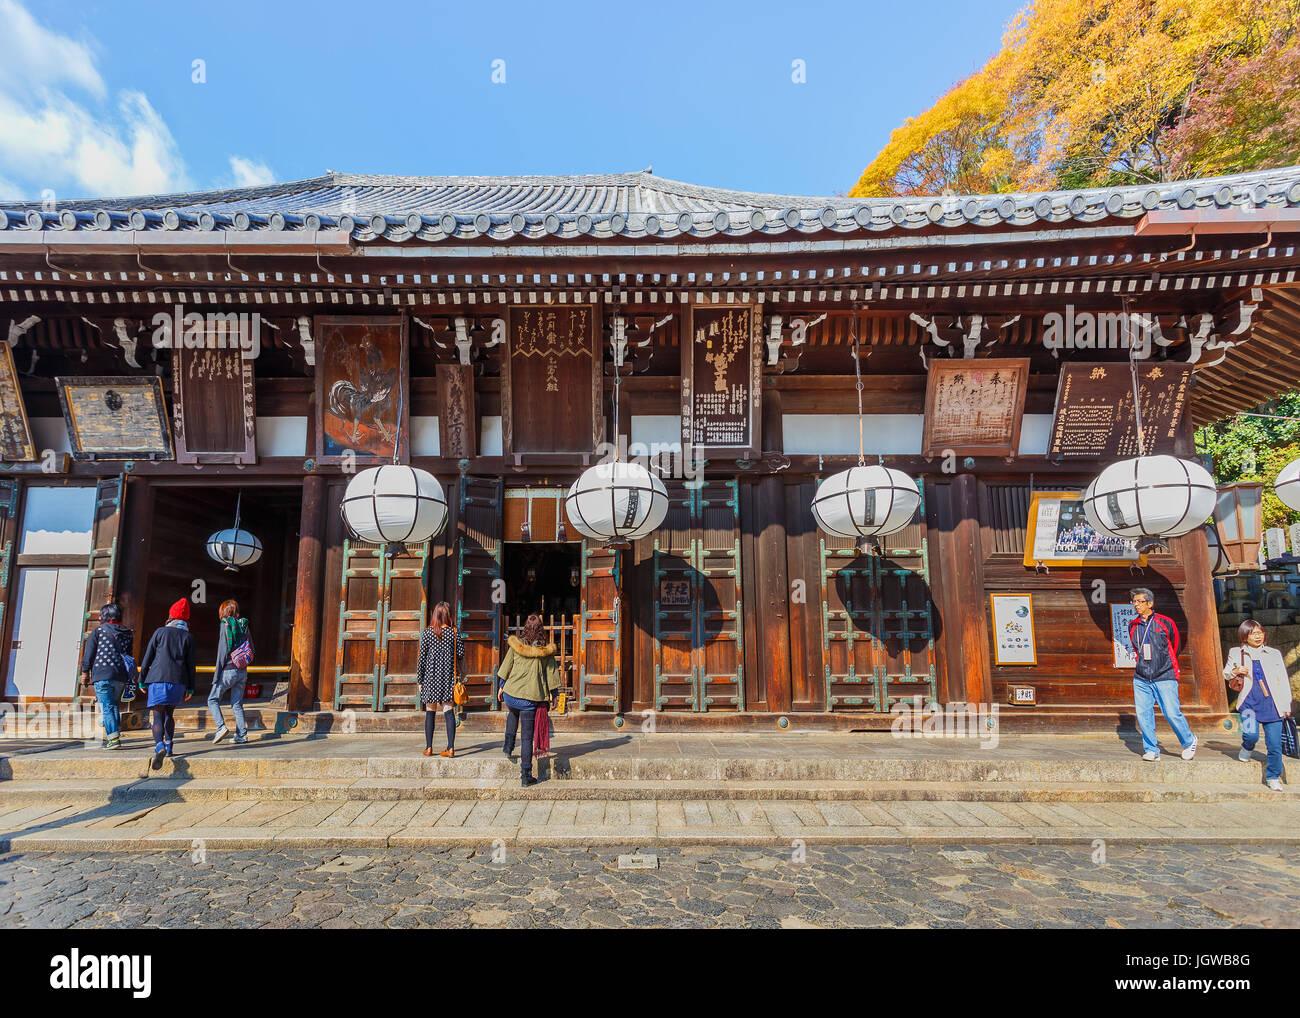 Nigatsu-do Hall at Todai-ji Temple in Nara, Japan - Stock Image